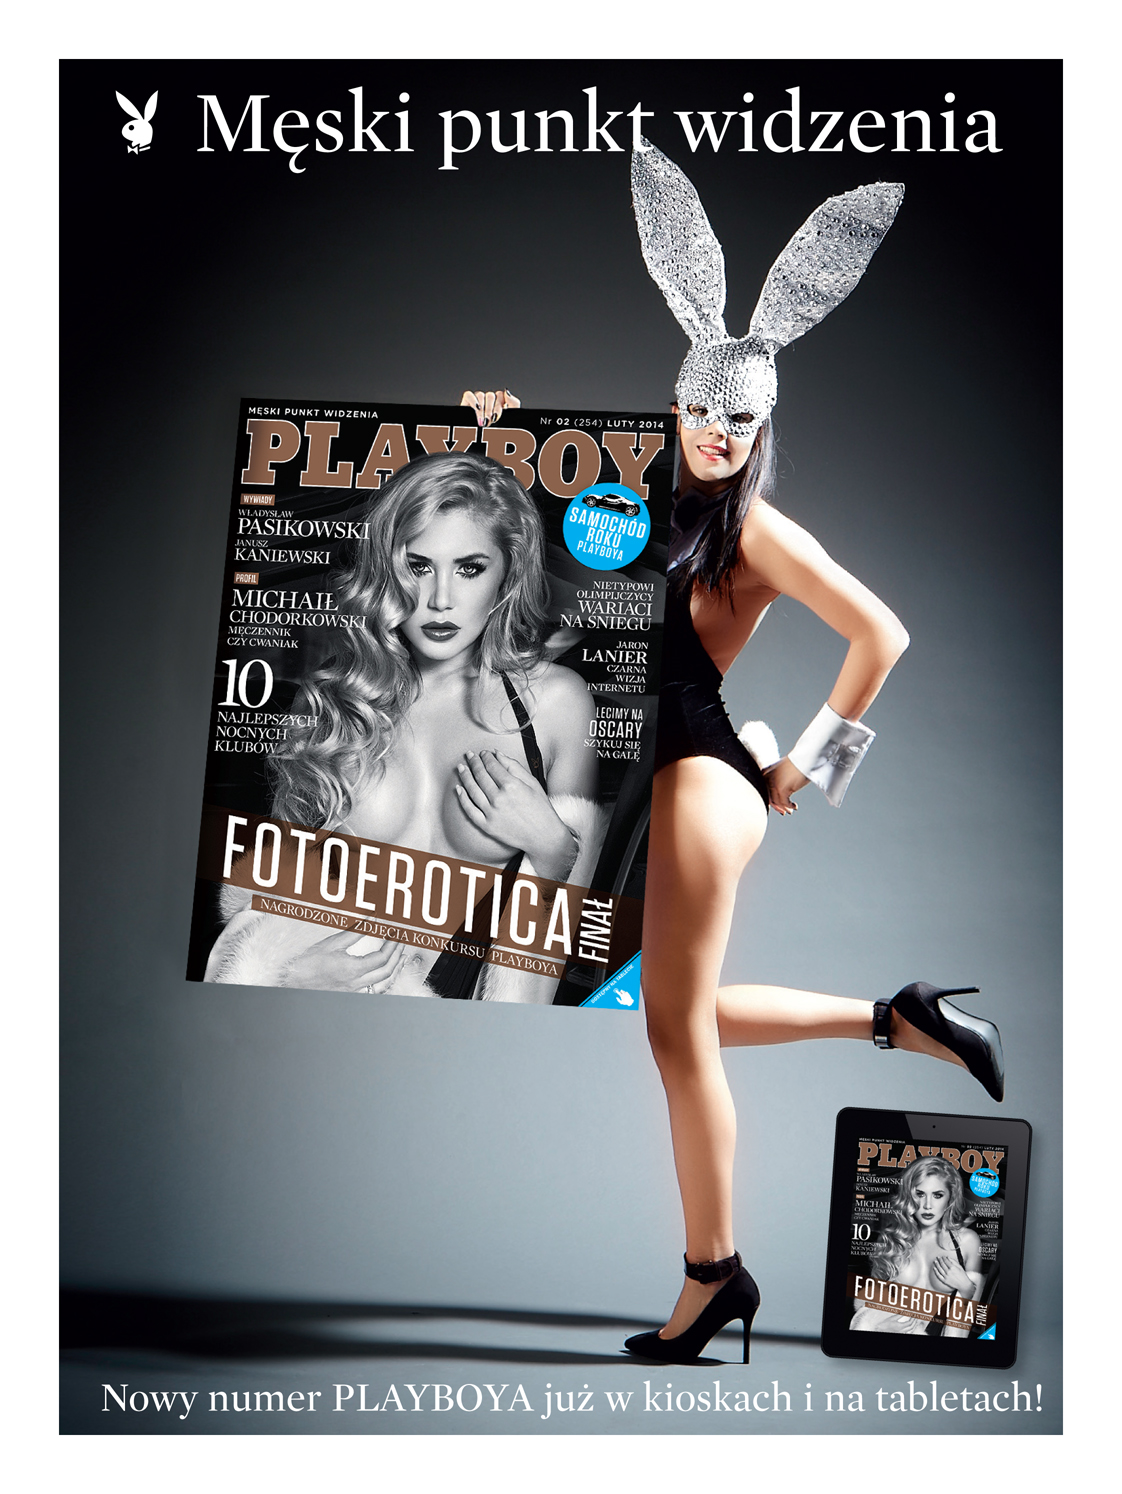 Playboy Fotoerotica 2013